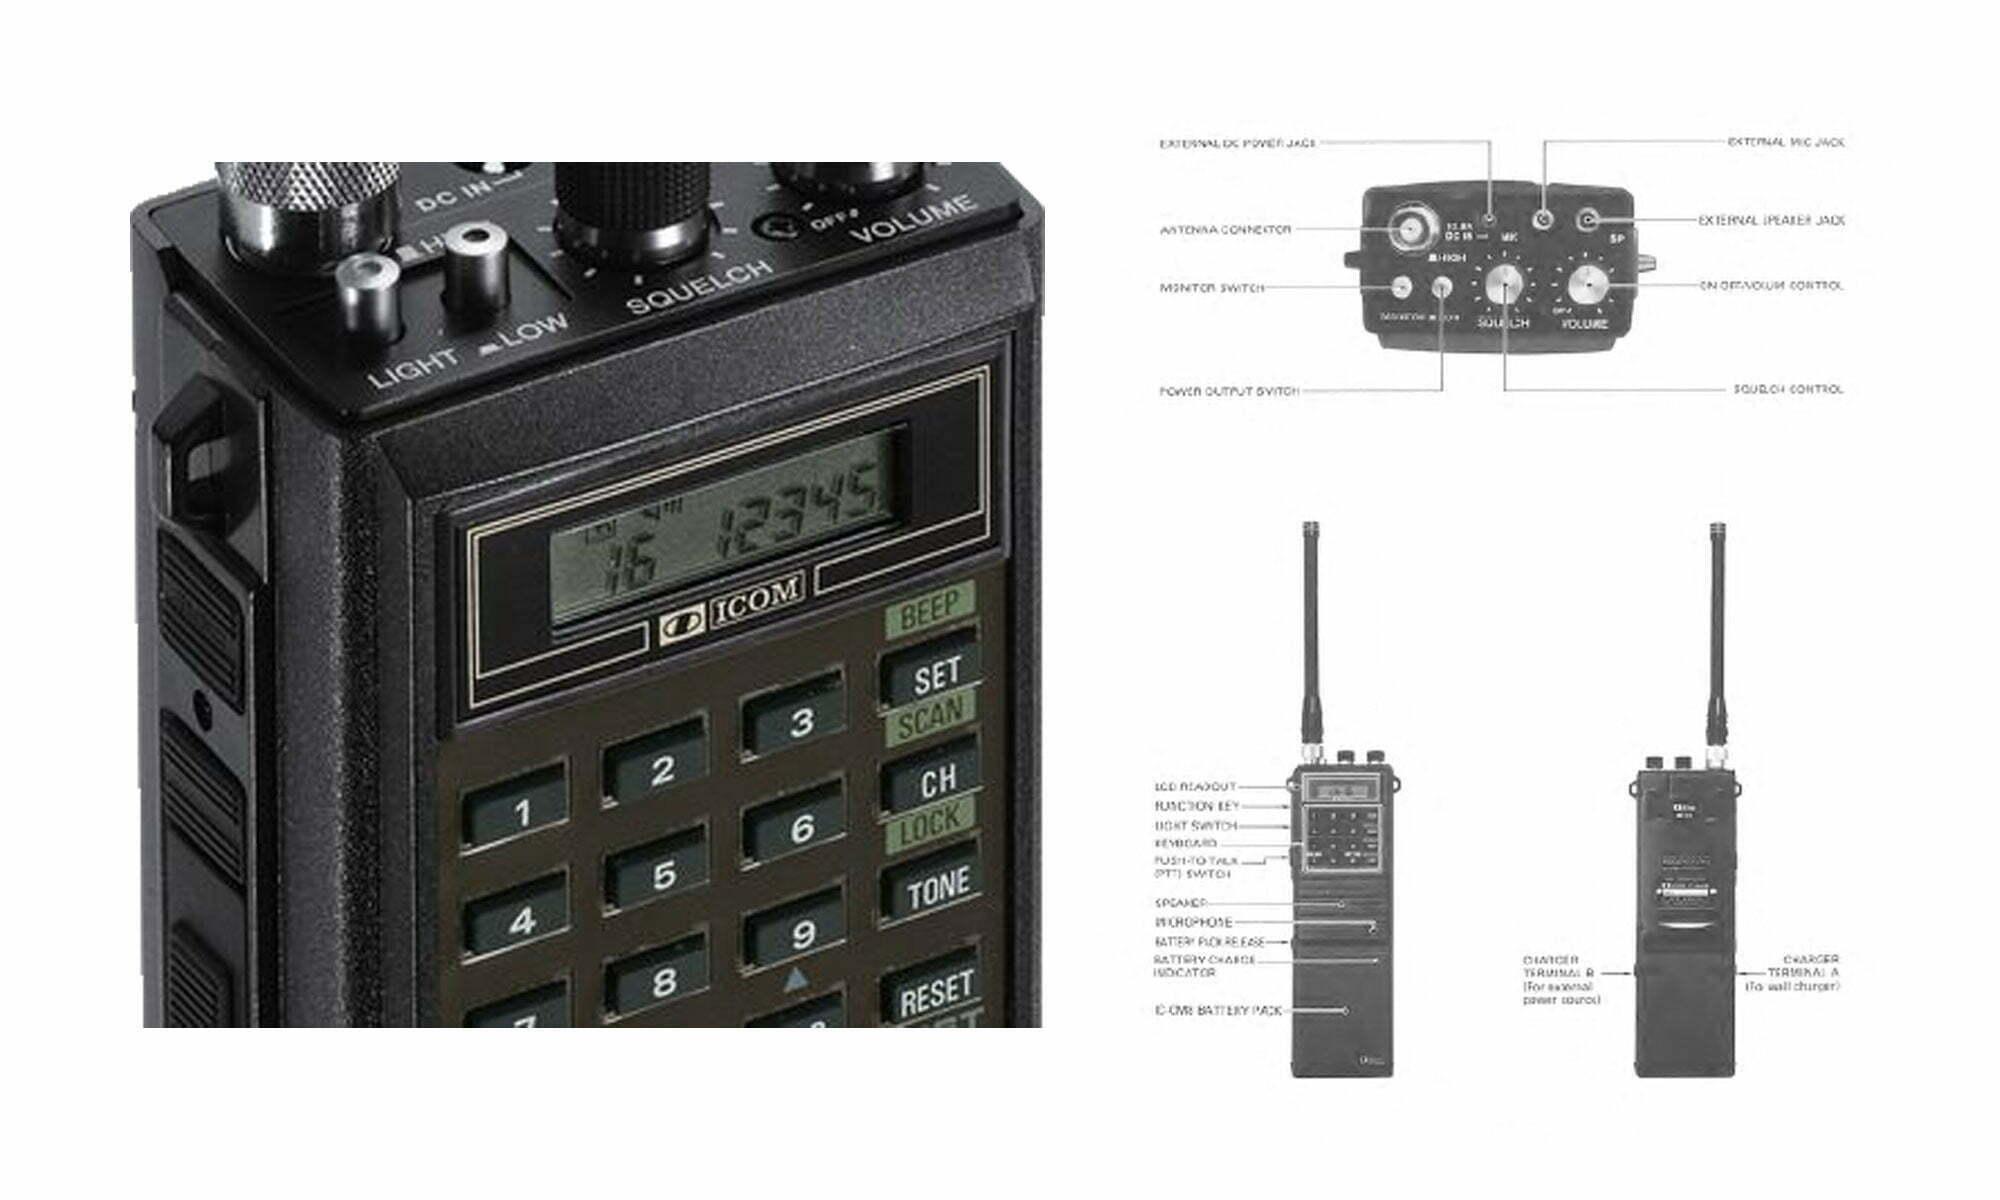 icom ic h16 service manual dw1zws panda antenna original rh dw1zws com Icom Instruction Manual Icom Ic-7300 Service Manual